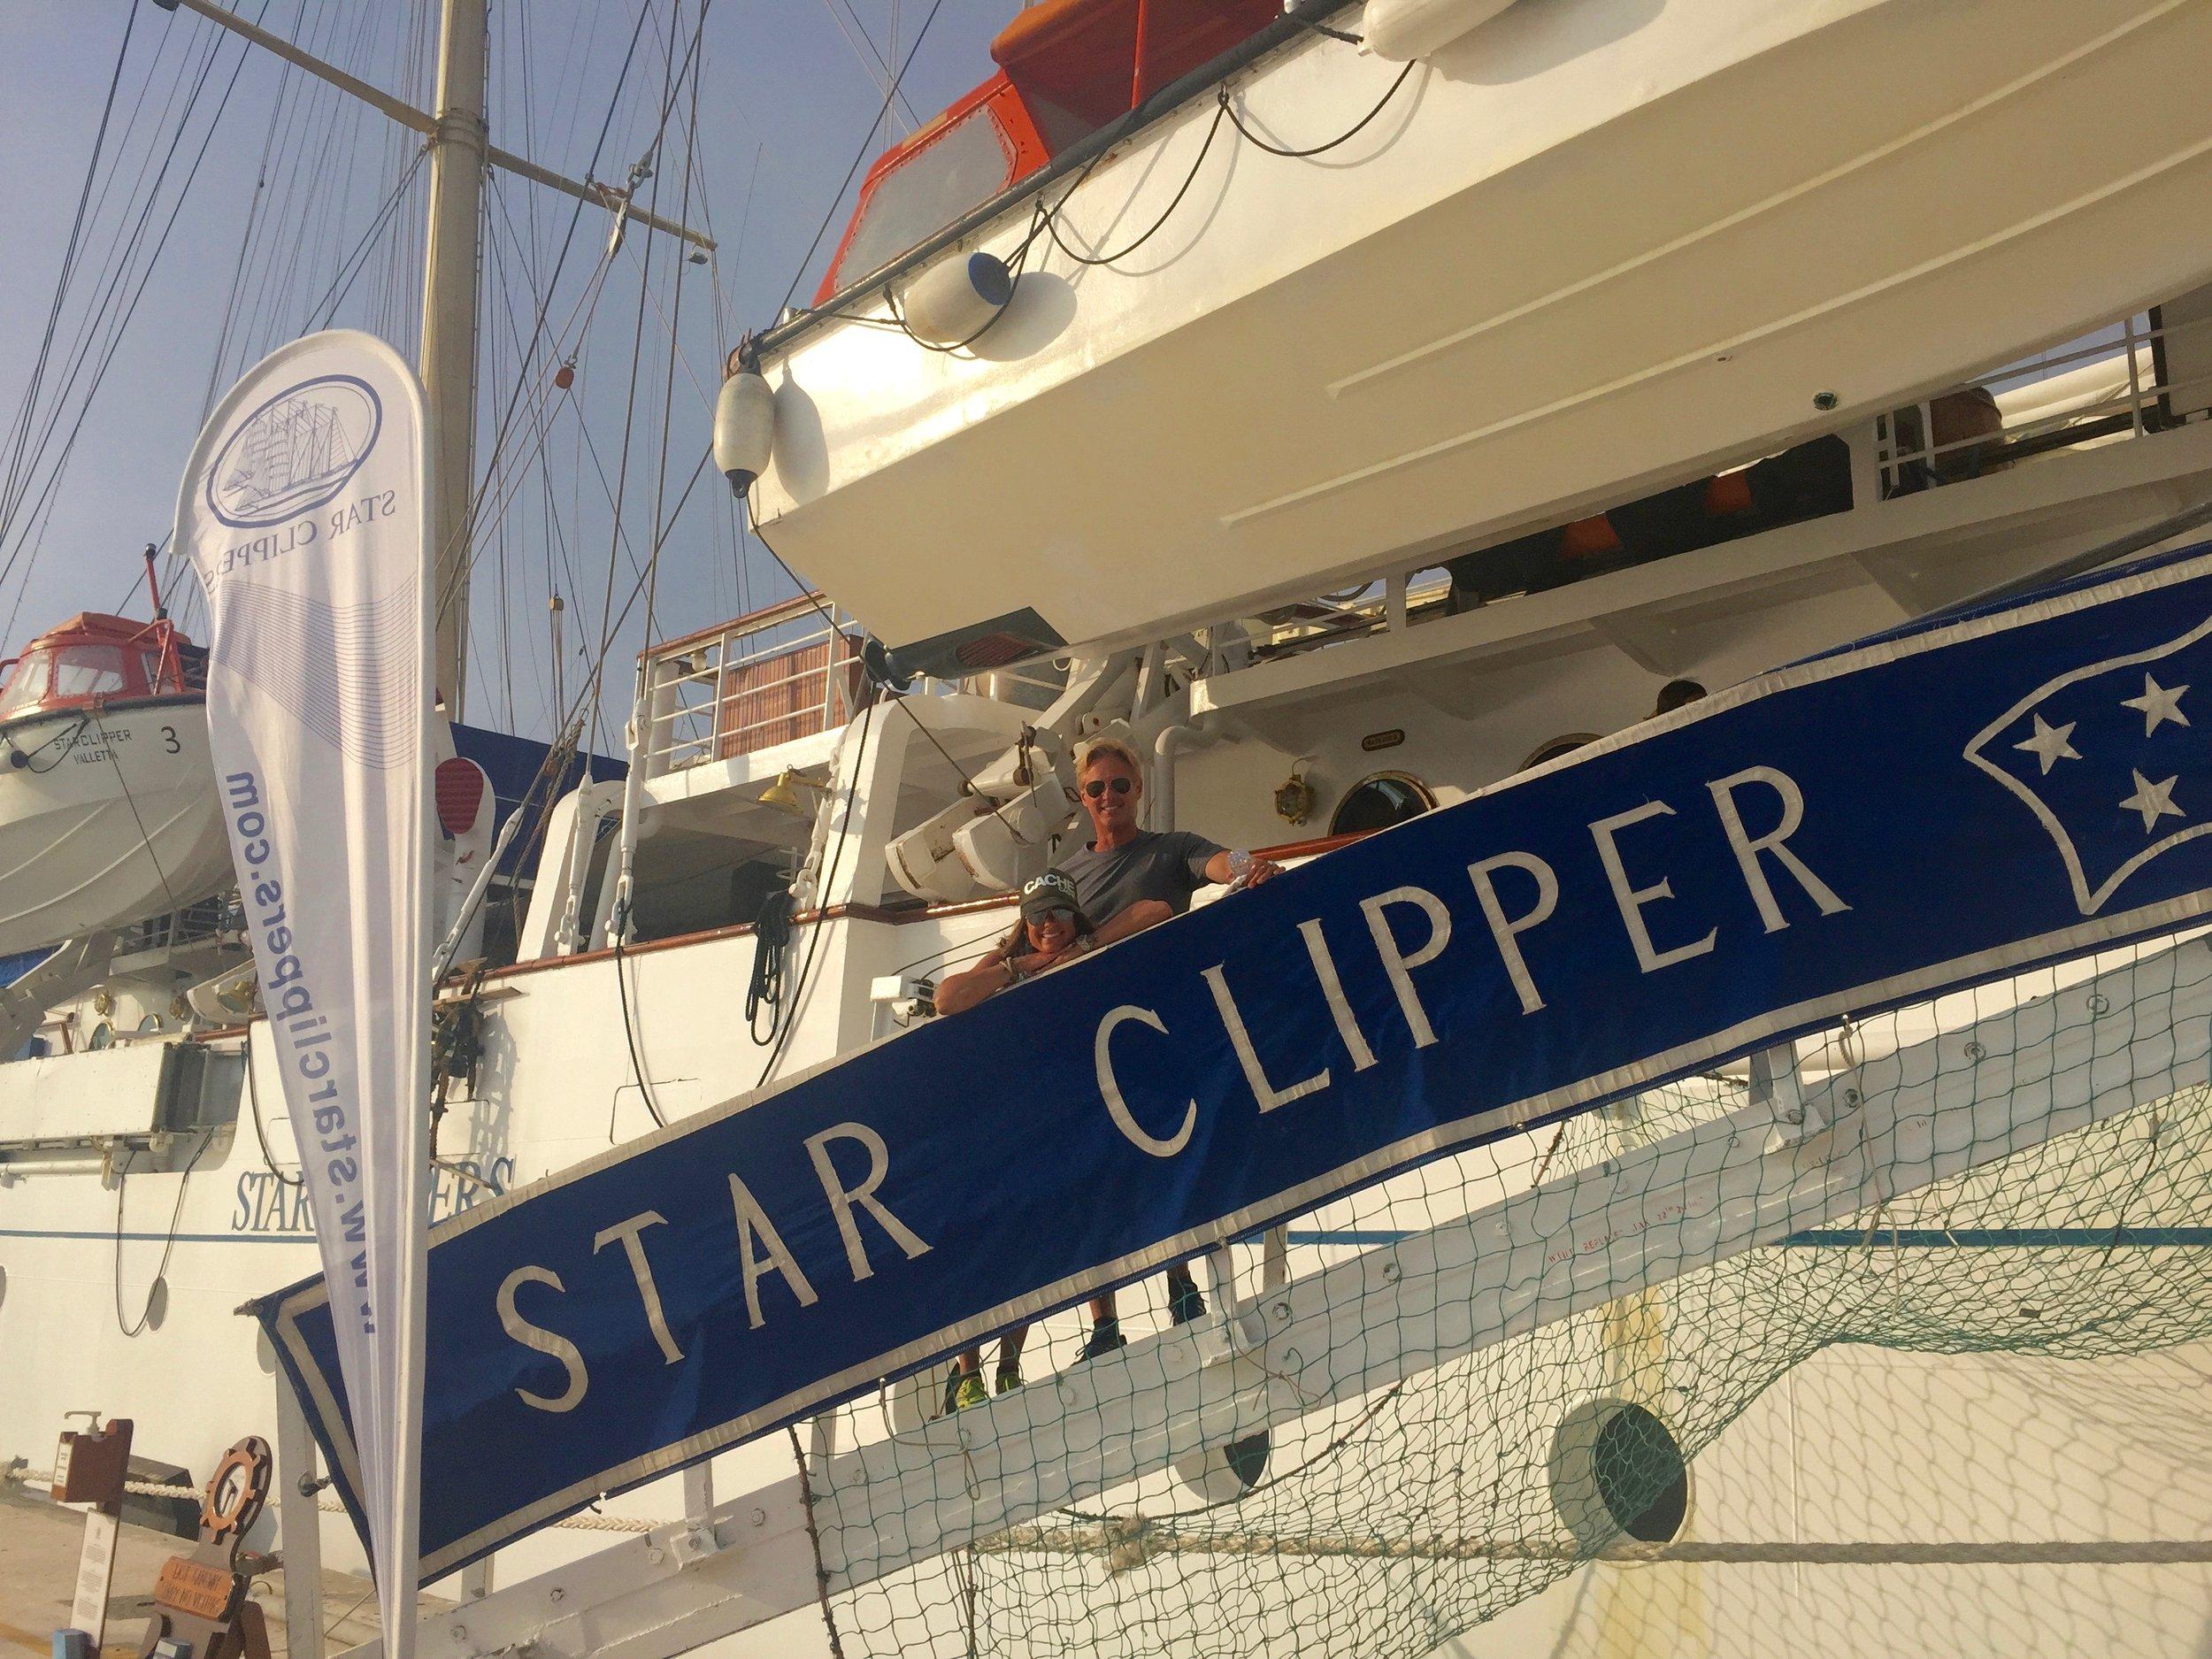 The Star Clipper